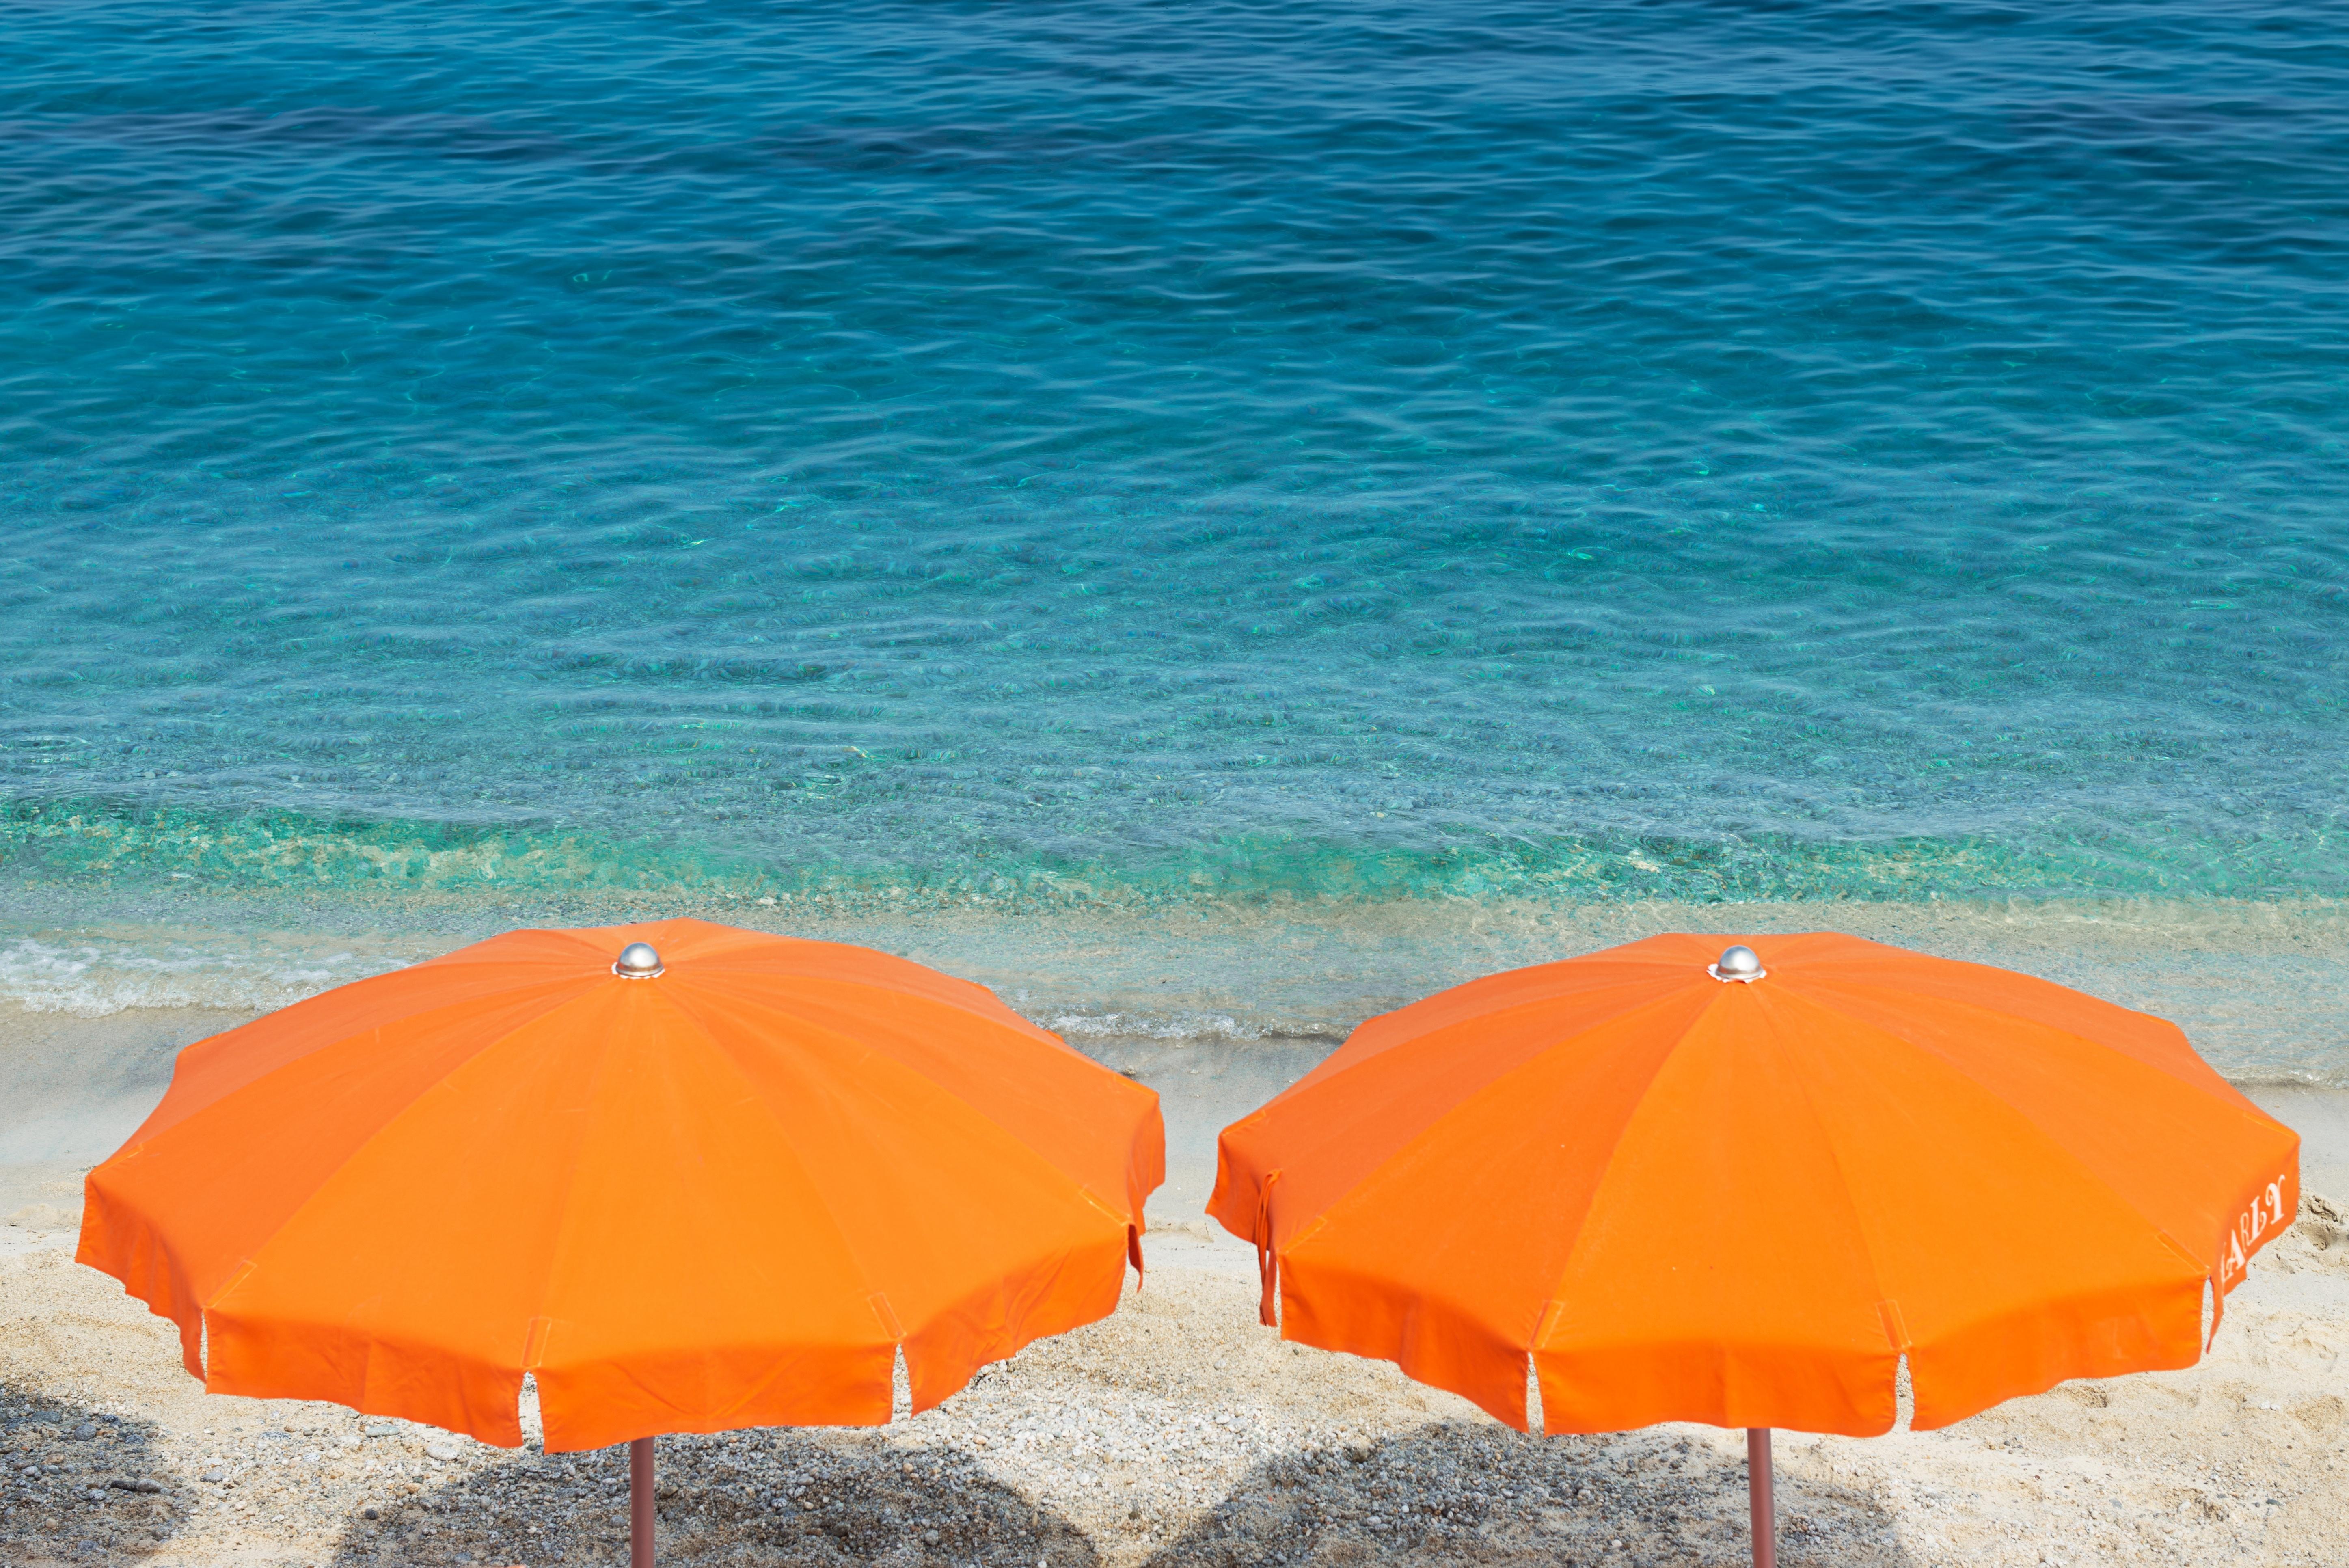 Big two orange parasol on the beach.